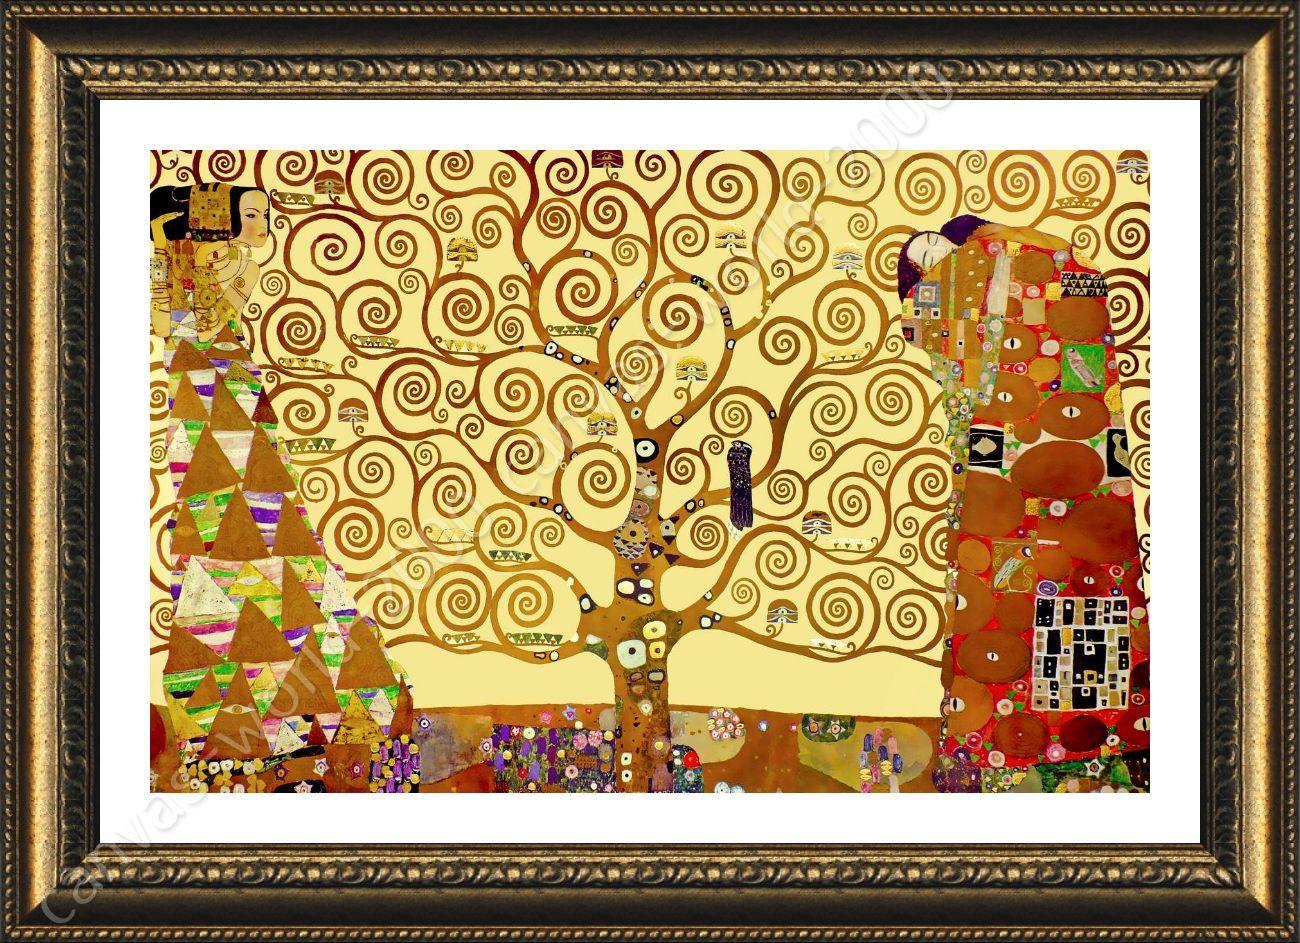 Tree Of Life Yellow by Gustav Klimt | Framed canvas | Wall Art ...